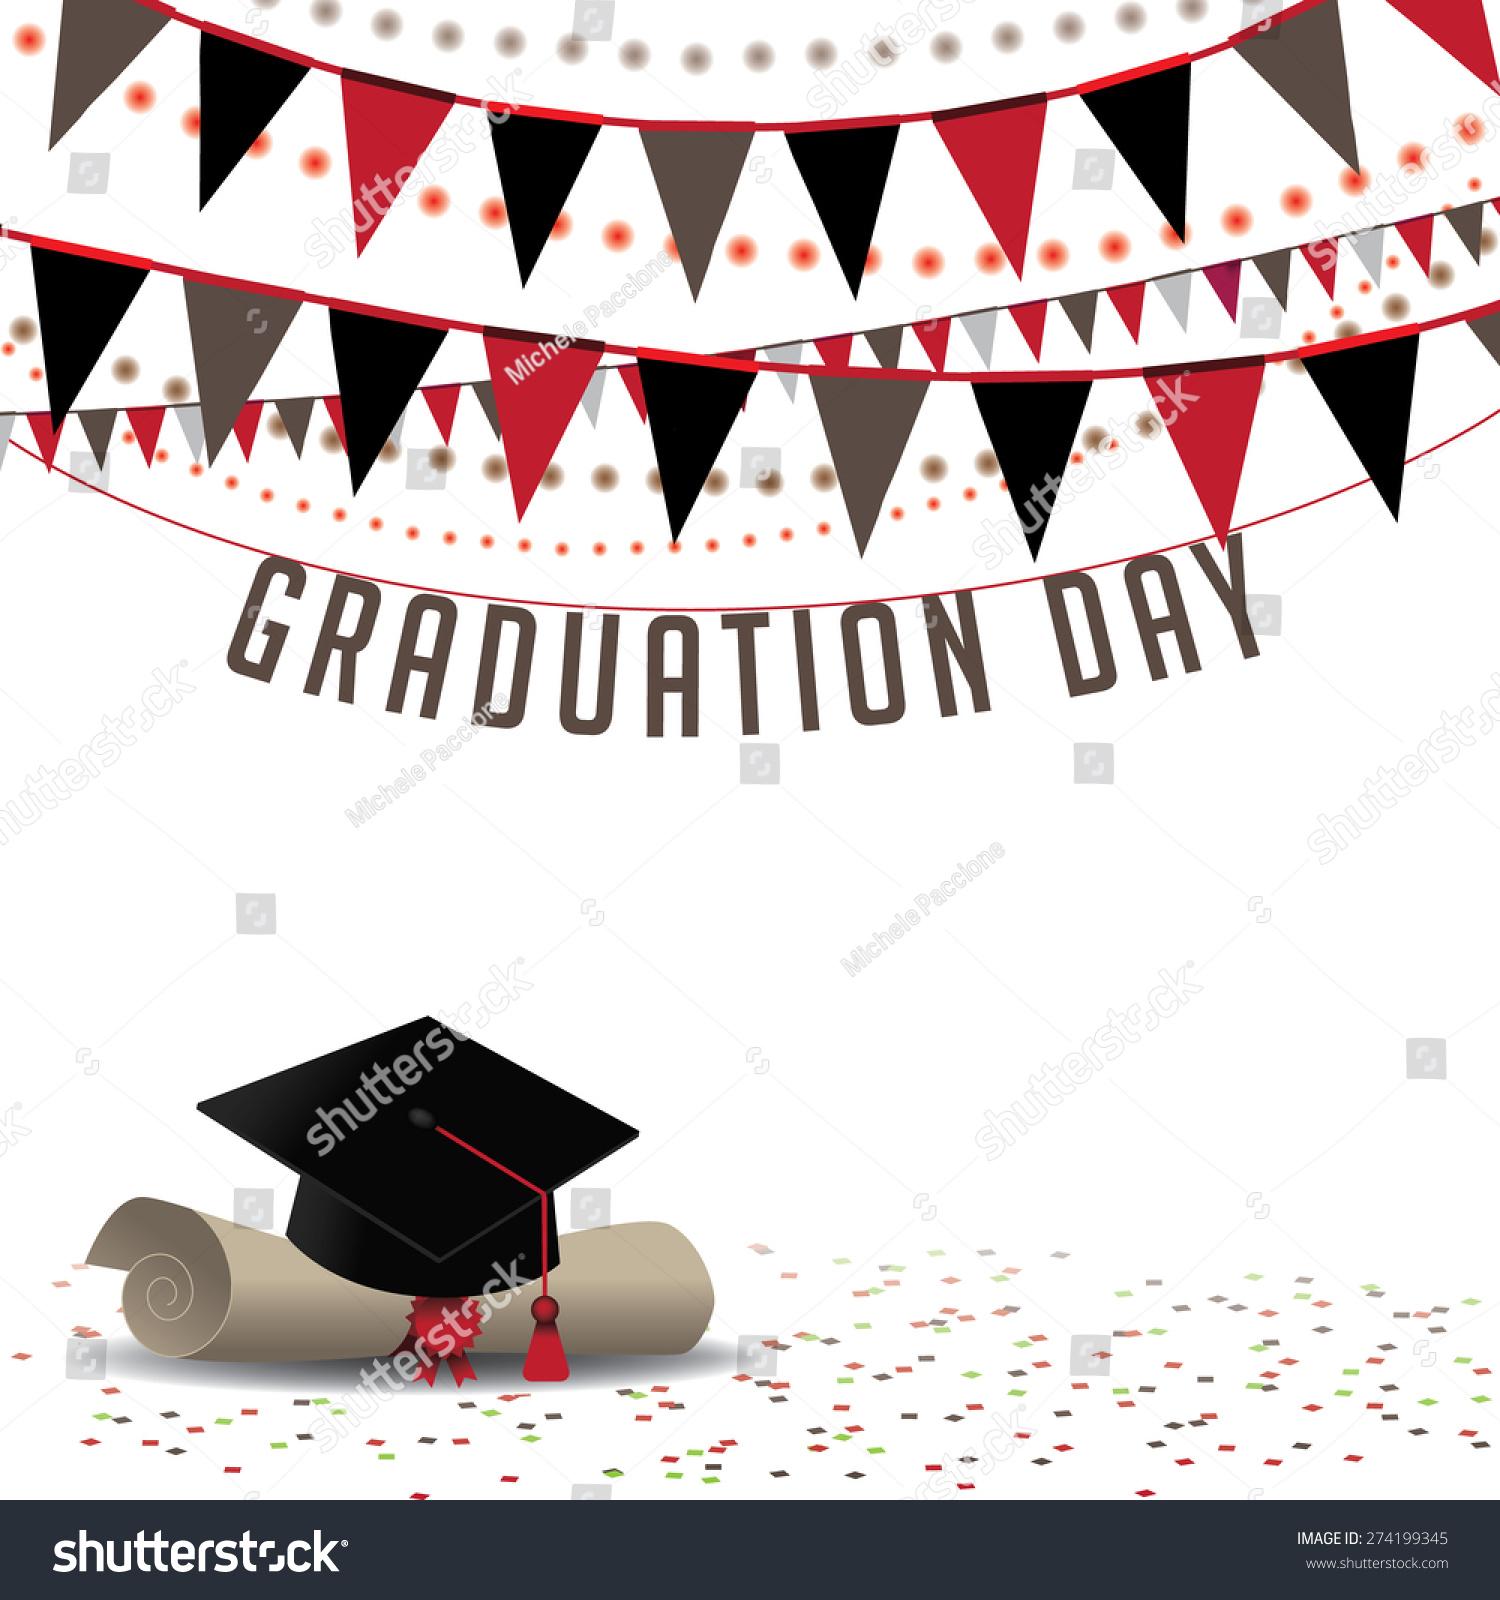 Graduation Day Background Eps 10 Vector Stock Vector ...